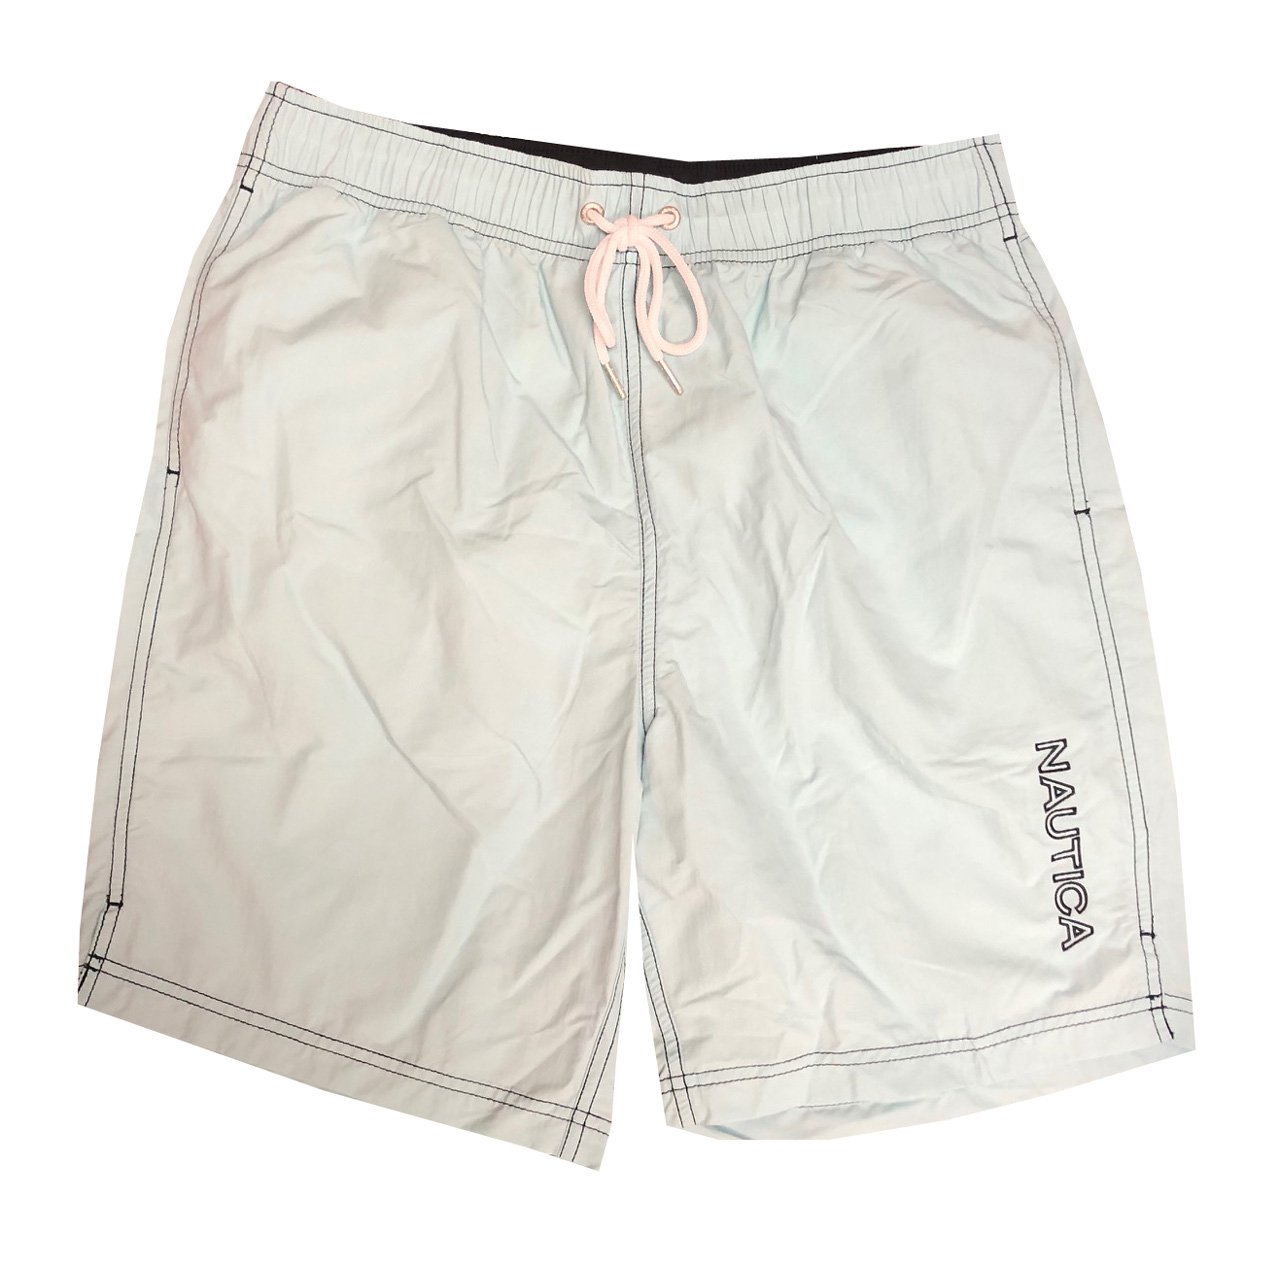 Nautica Mens Quick-Dry Logo Swim Trunk Shorts (XL, Light Aqua(478))